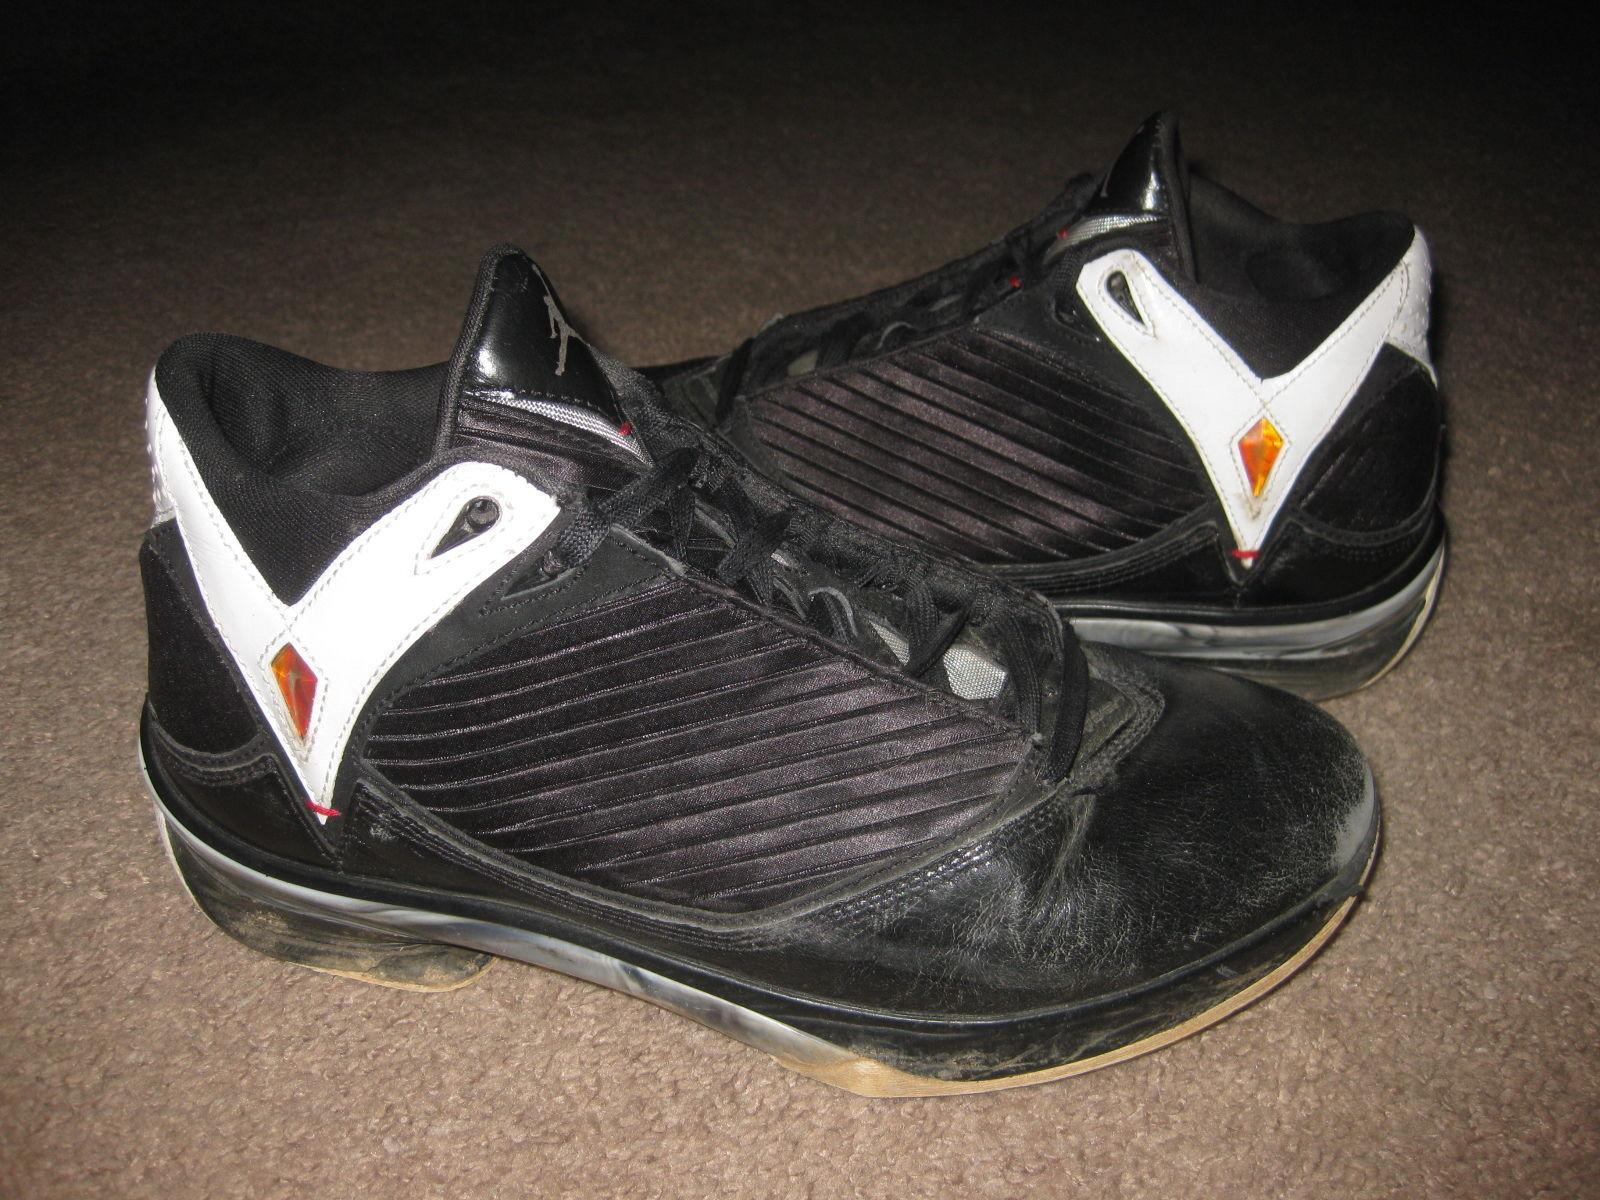 on sale 029be 14542 Nike Air Jordan 2009 Retro - 343084-062 - and 20 similar items